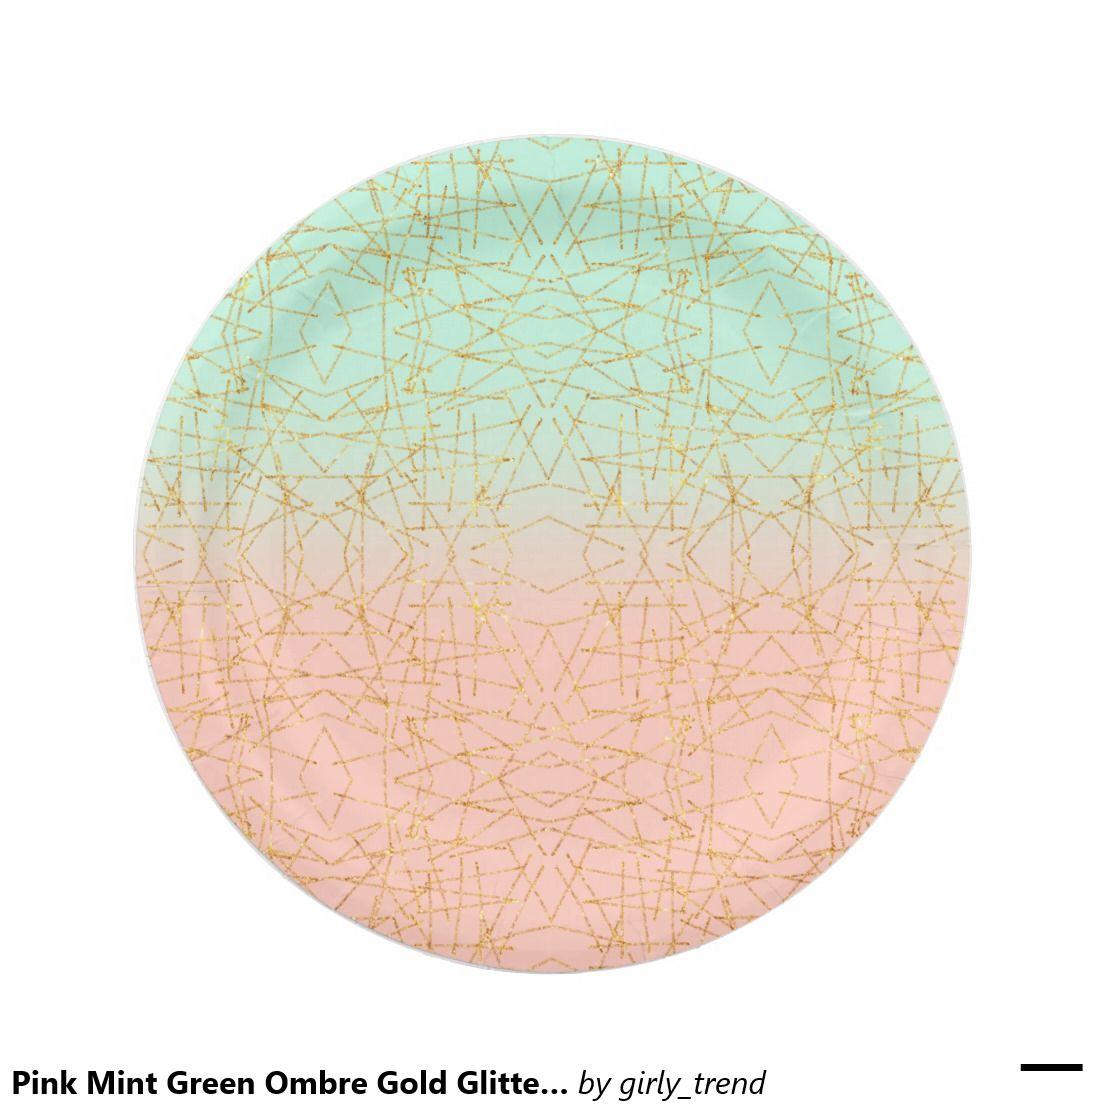 Pink Mint Green Ombre Gold Glitter Geometric 7 Inch Paper Plate  sc 1 st  Pinterest & Pink Mint Green Ombre Gold Glitter Geometric 7 Inch Paper Plate ...